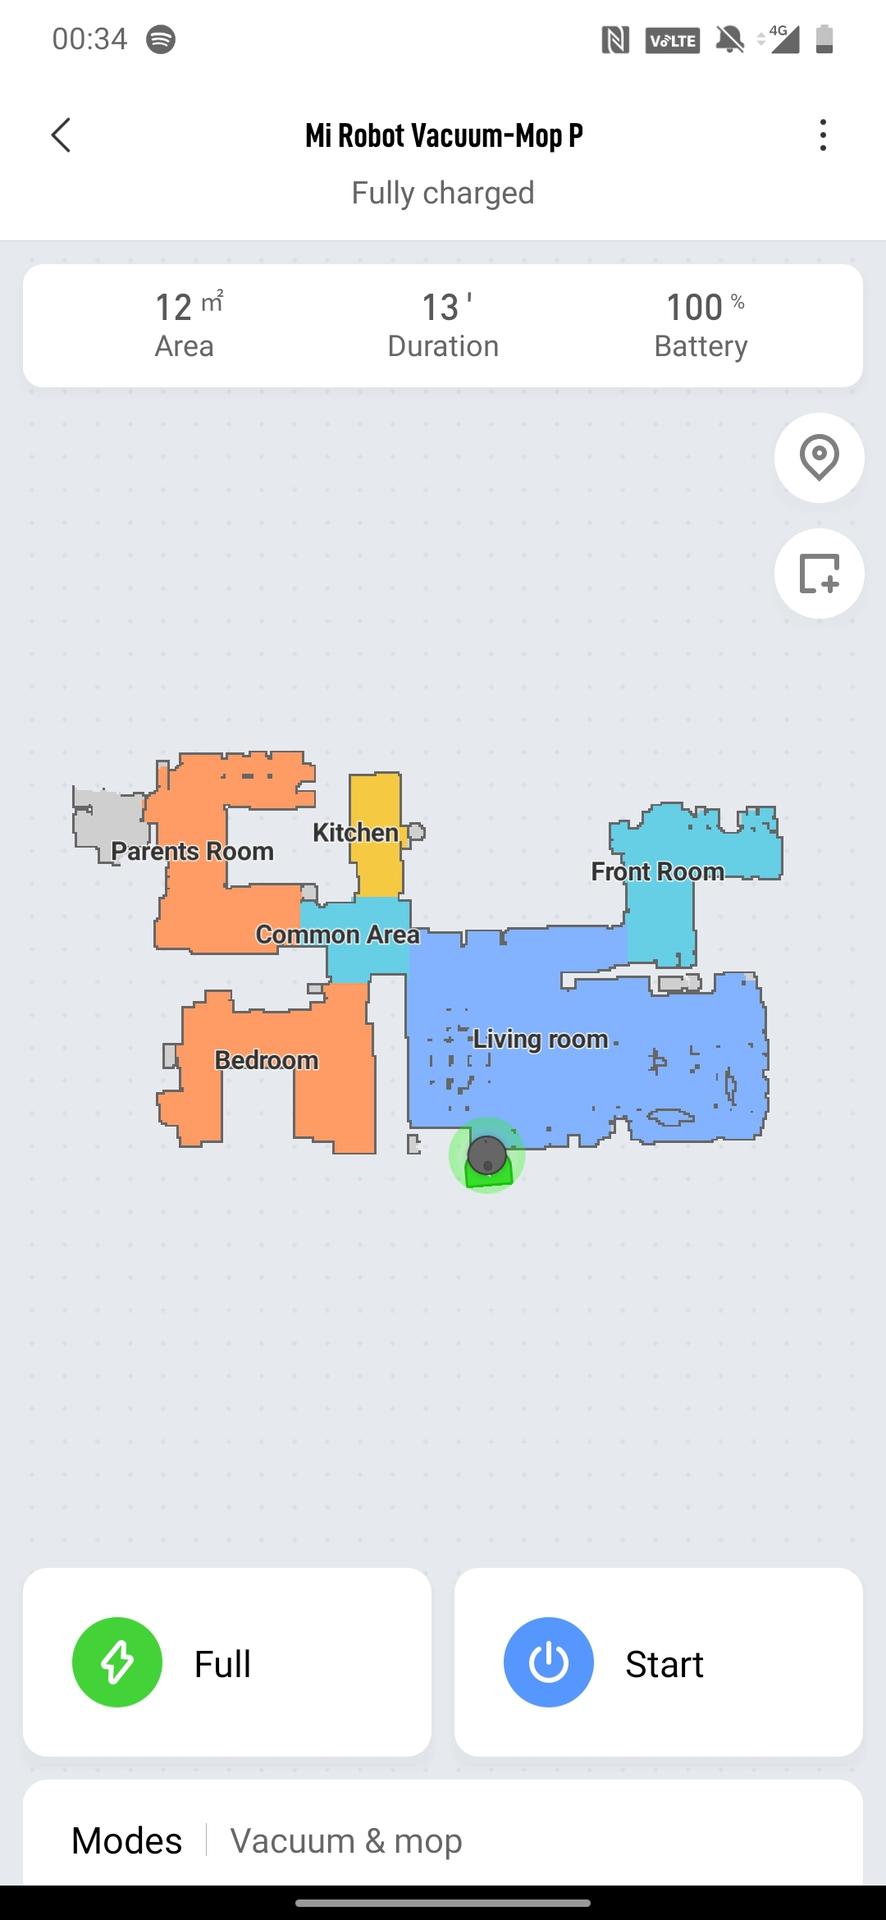 Mi Robot Vacuum P map page